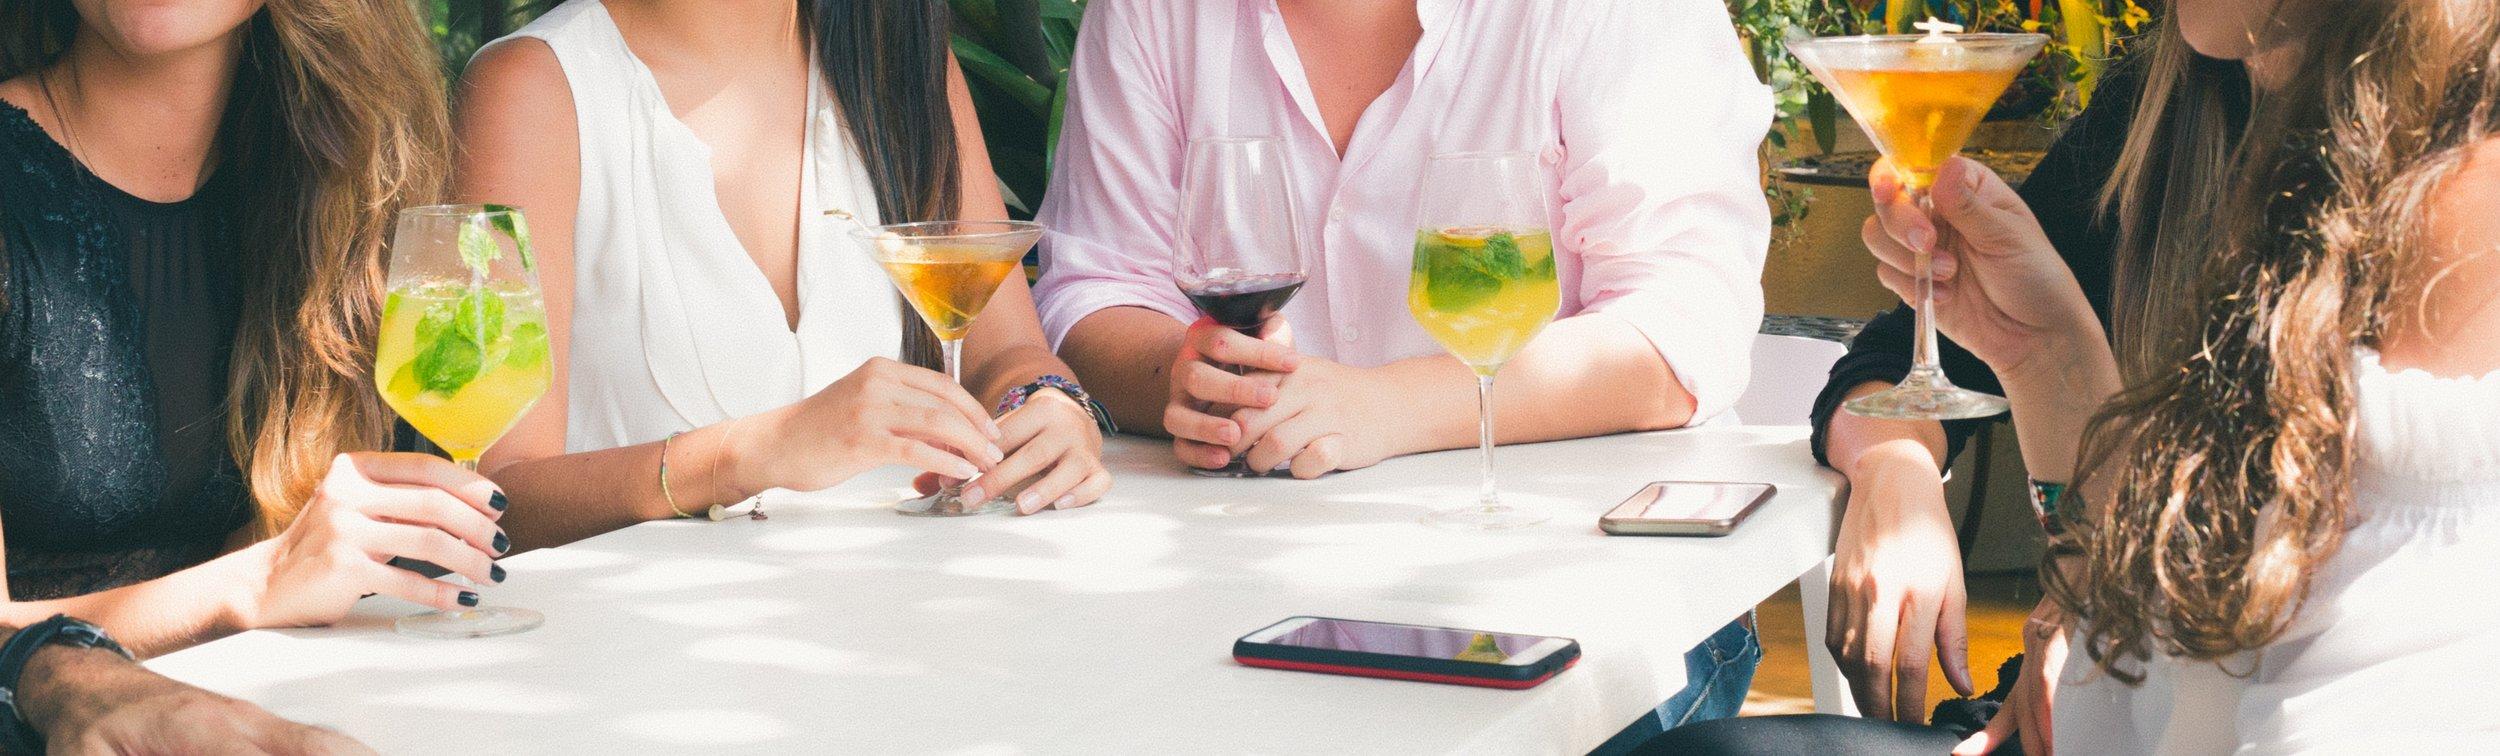 alcohol-cellphone-cocktail-glass-1097390.jpg